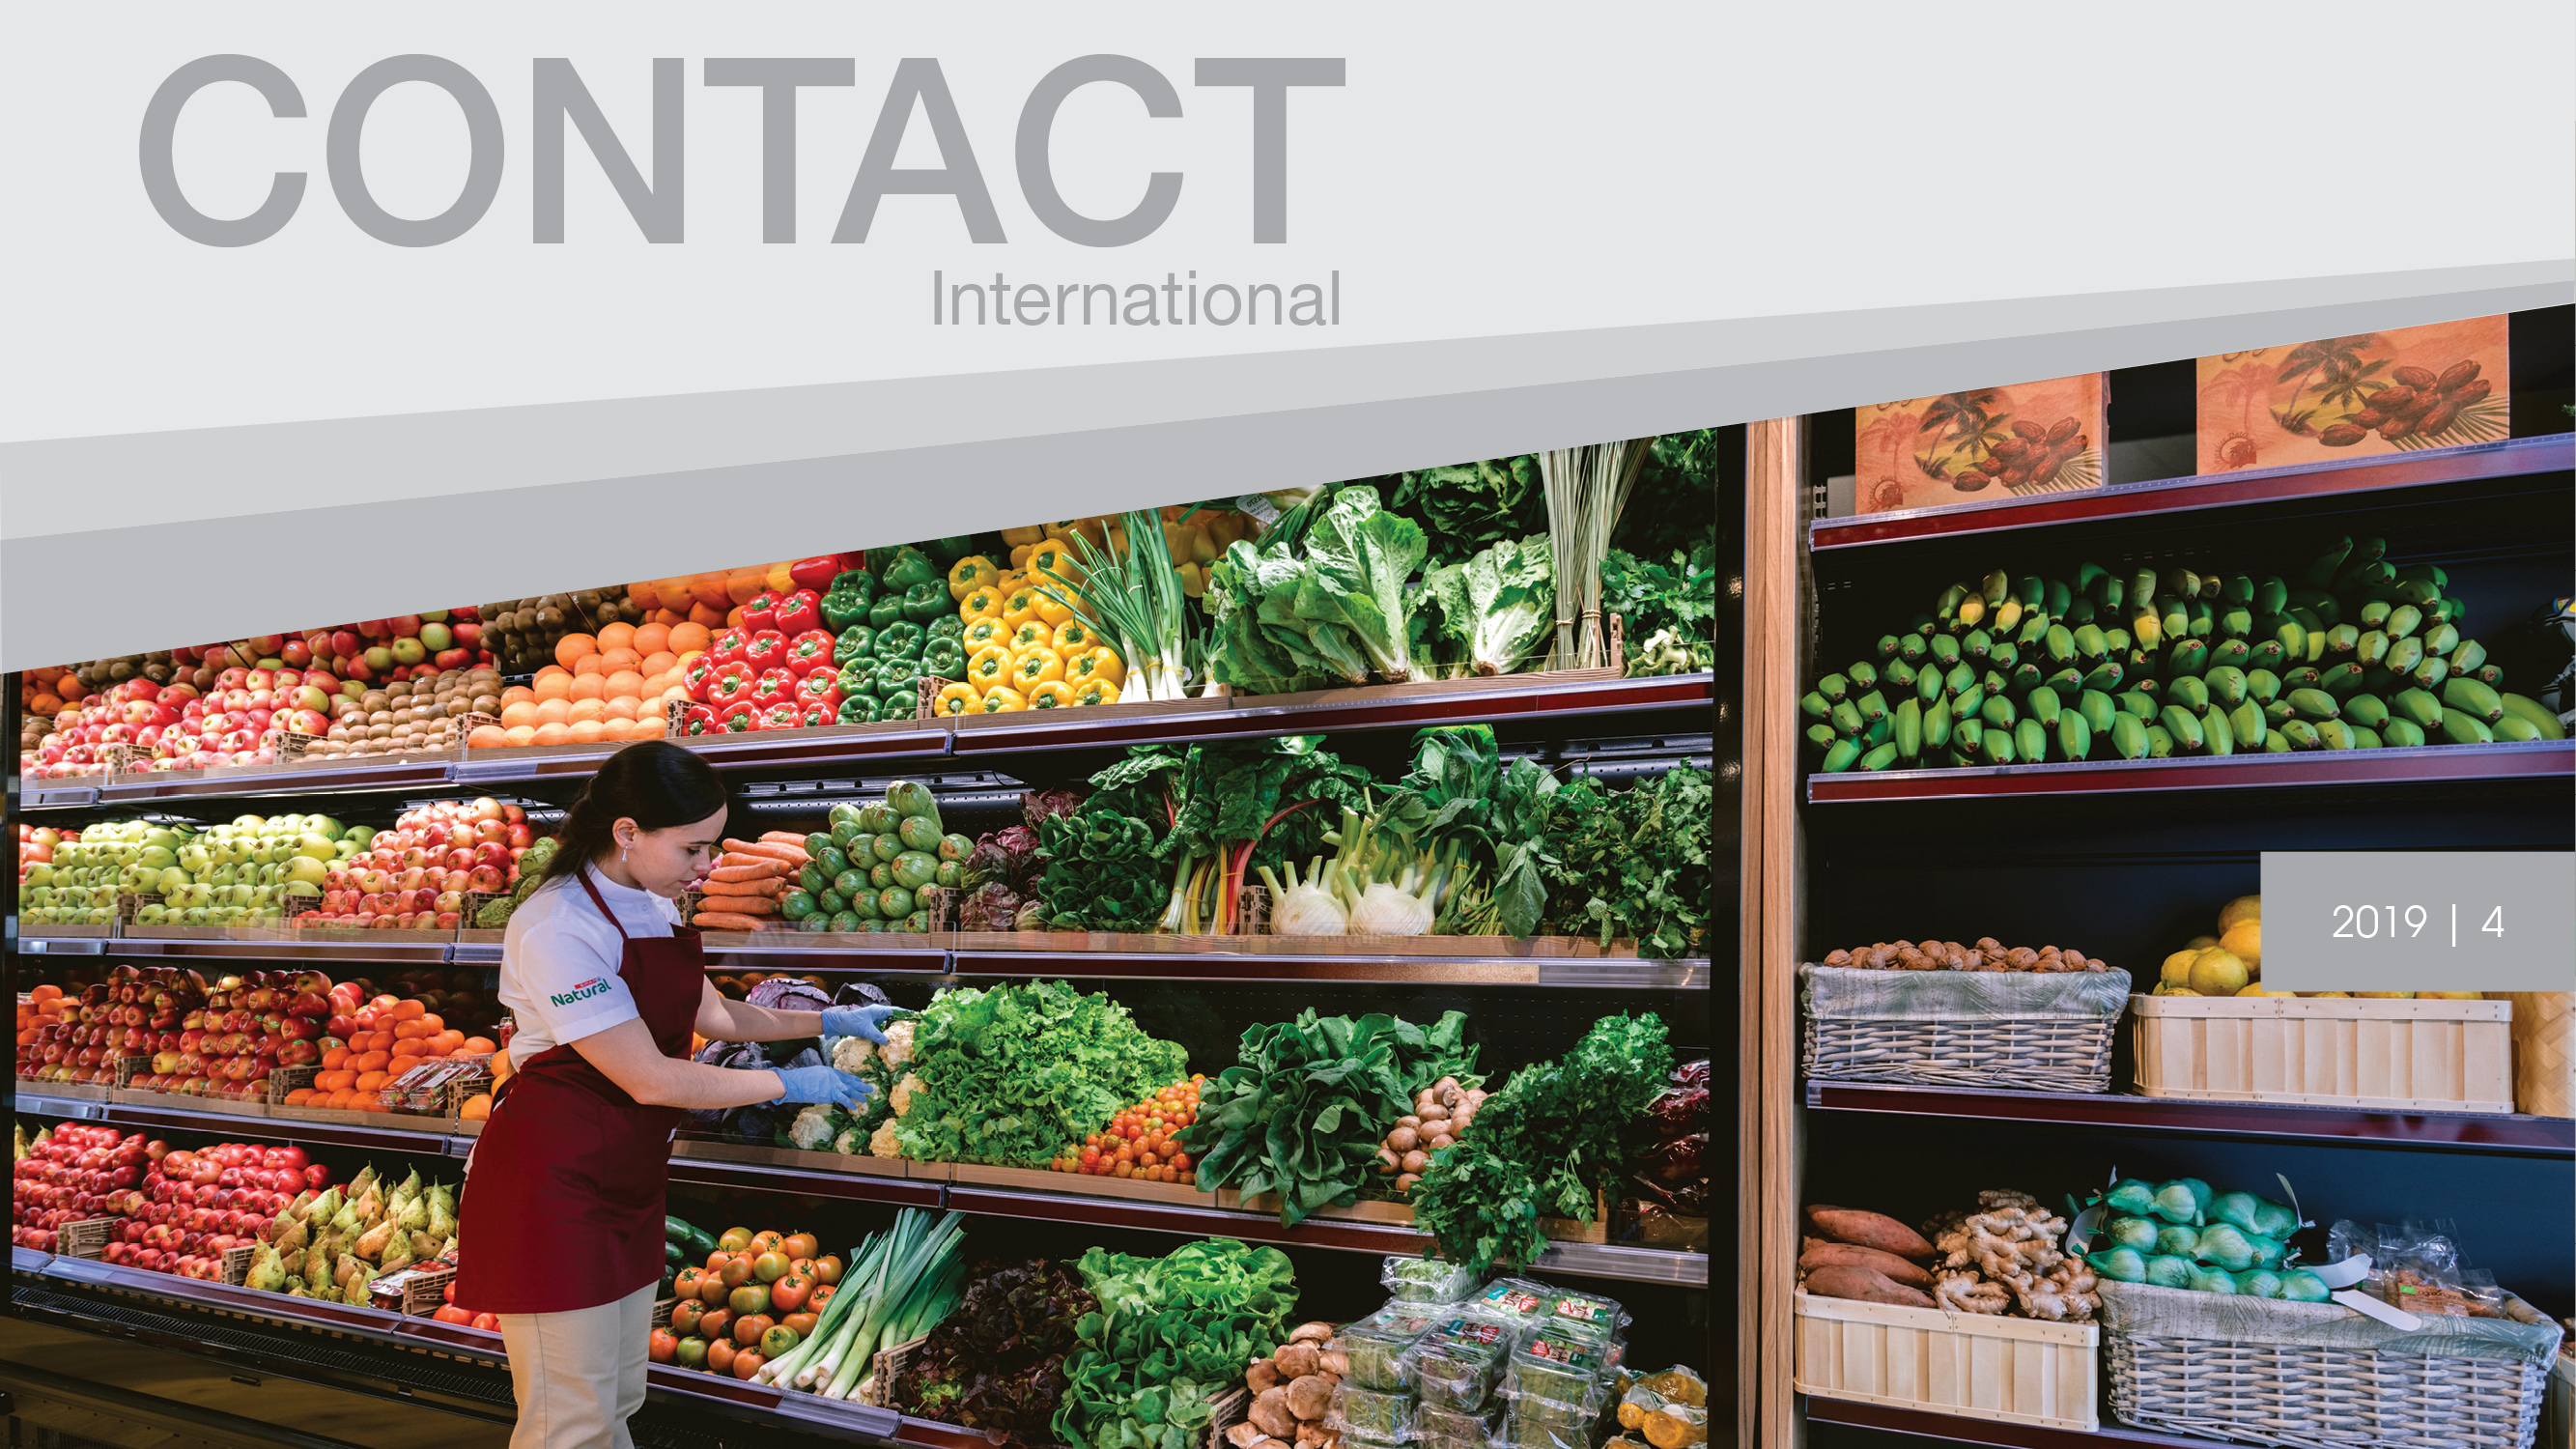 Latest SPAR Contact International magazine